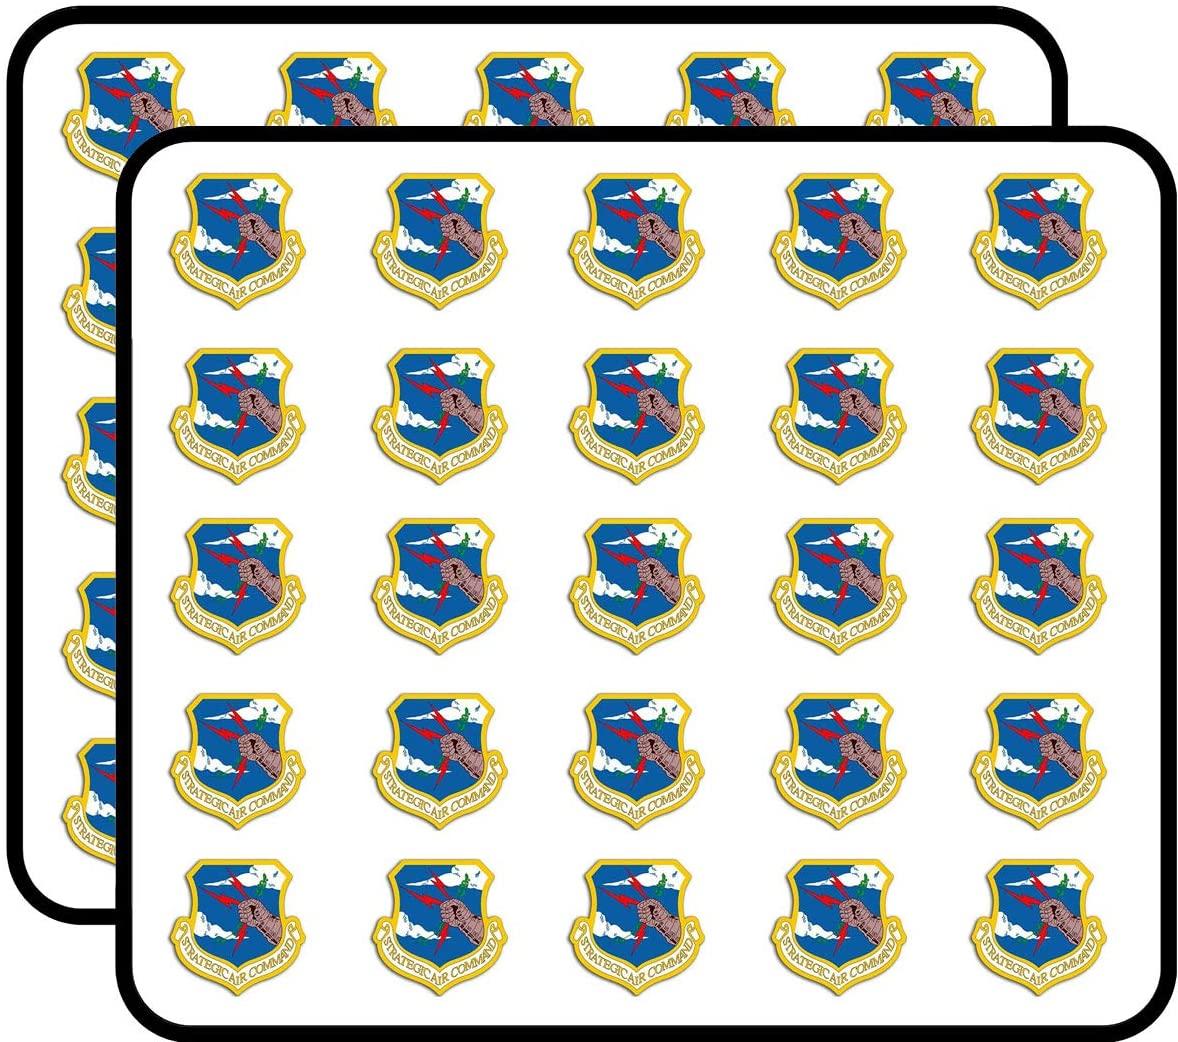 Shield Shaped USAF Strategic Air Command - air Force Veteran Sticker for Scrapbooking, Calendars, Arts, Kids DIY Crafts, Album, Bullet Journals 50 Pack